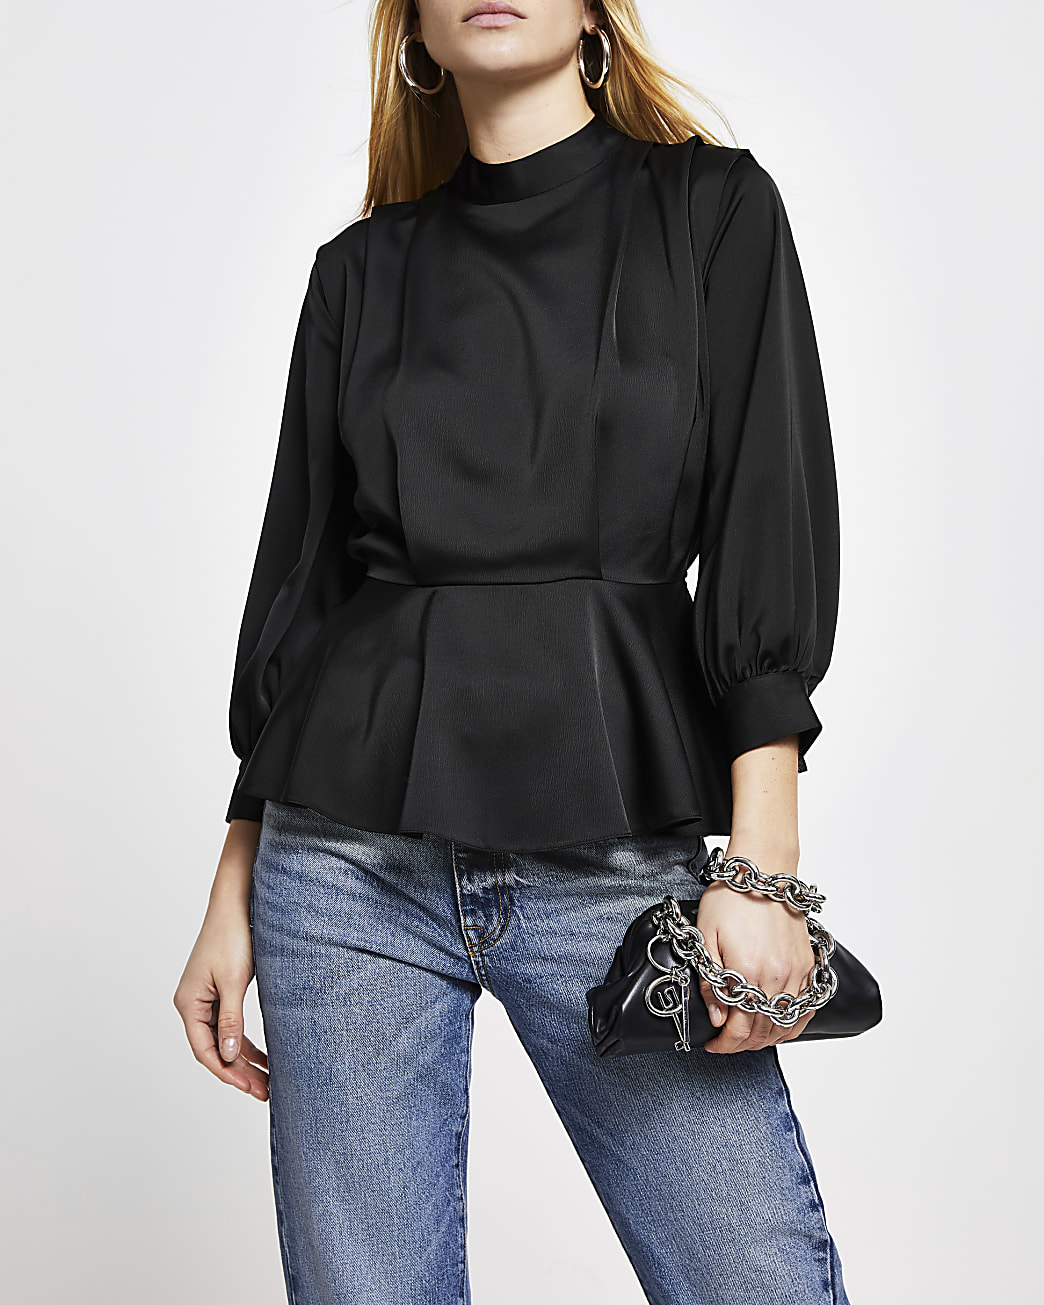 Black peplum pleat long sleeve top